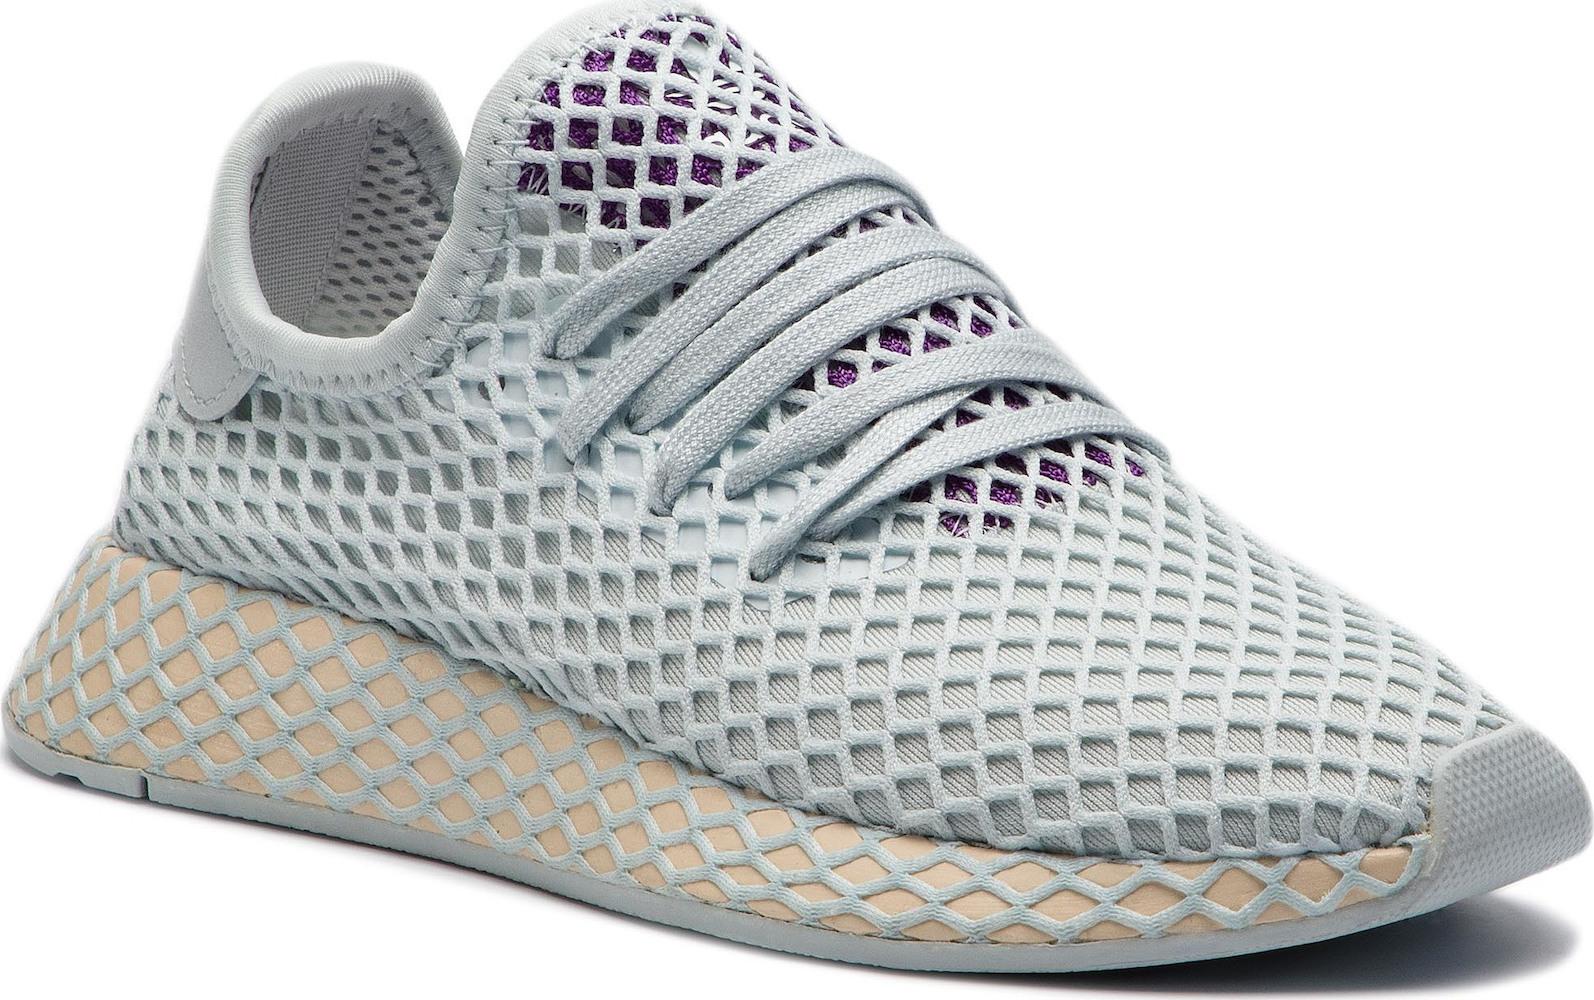 Adidas Deerupt Runner CG6083